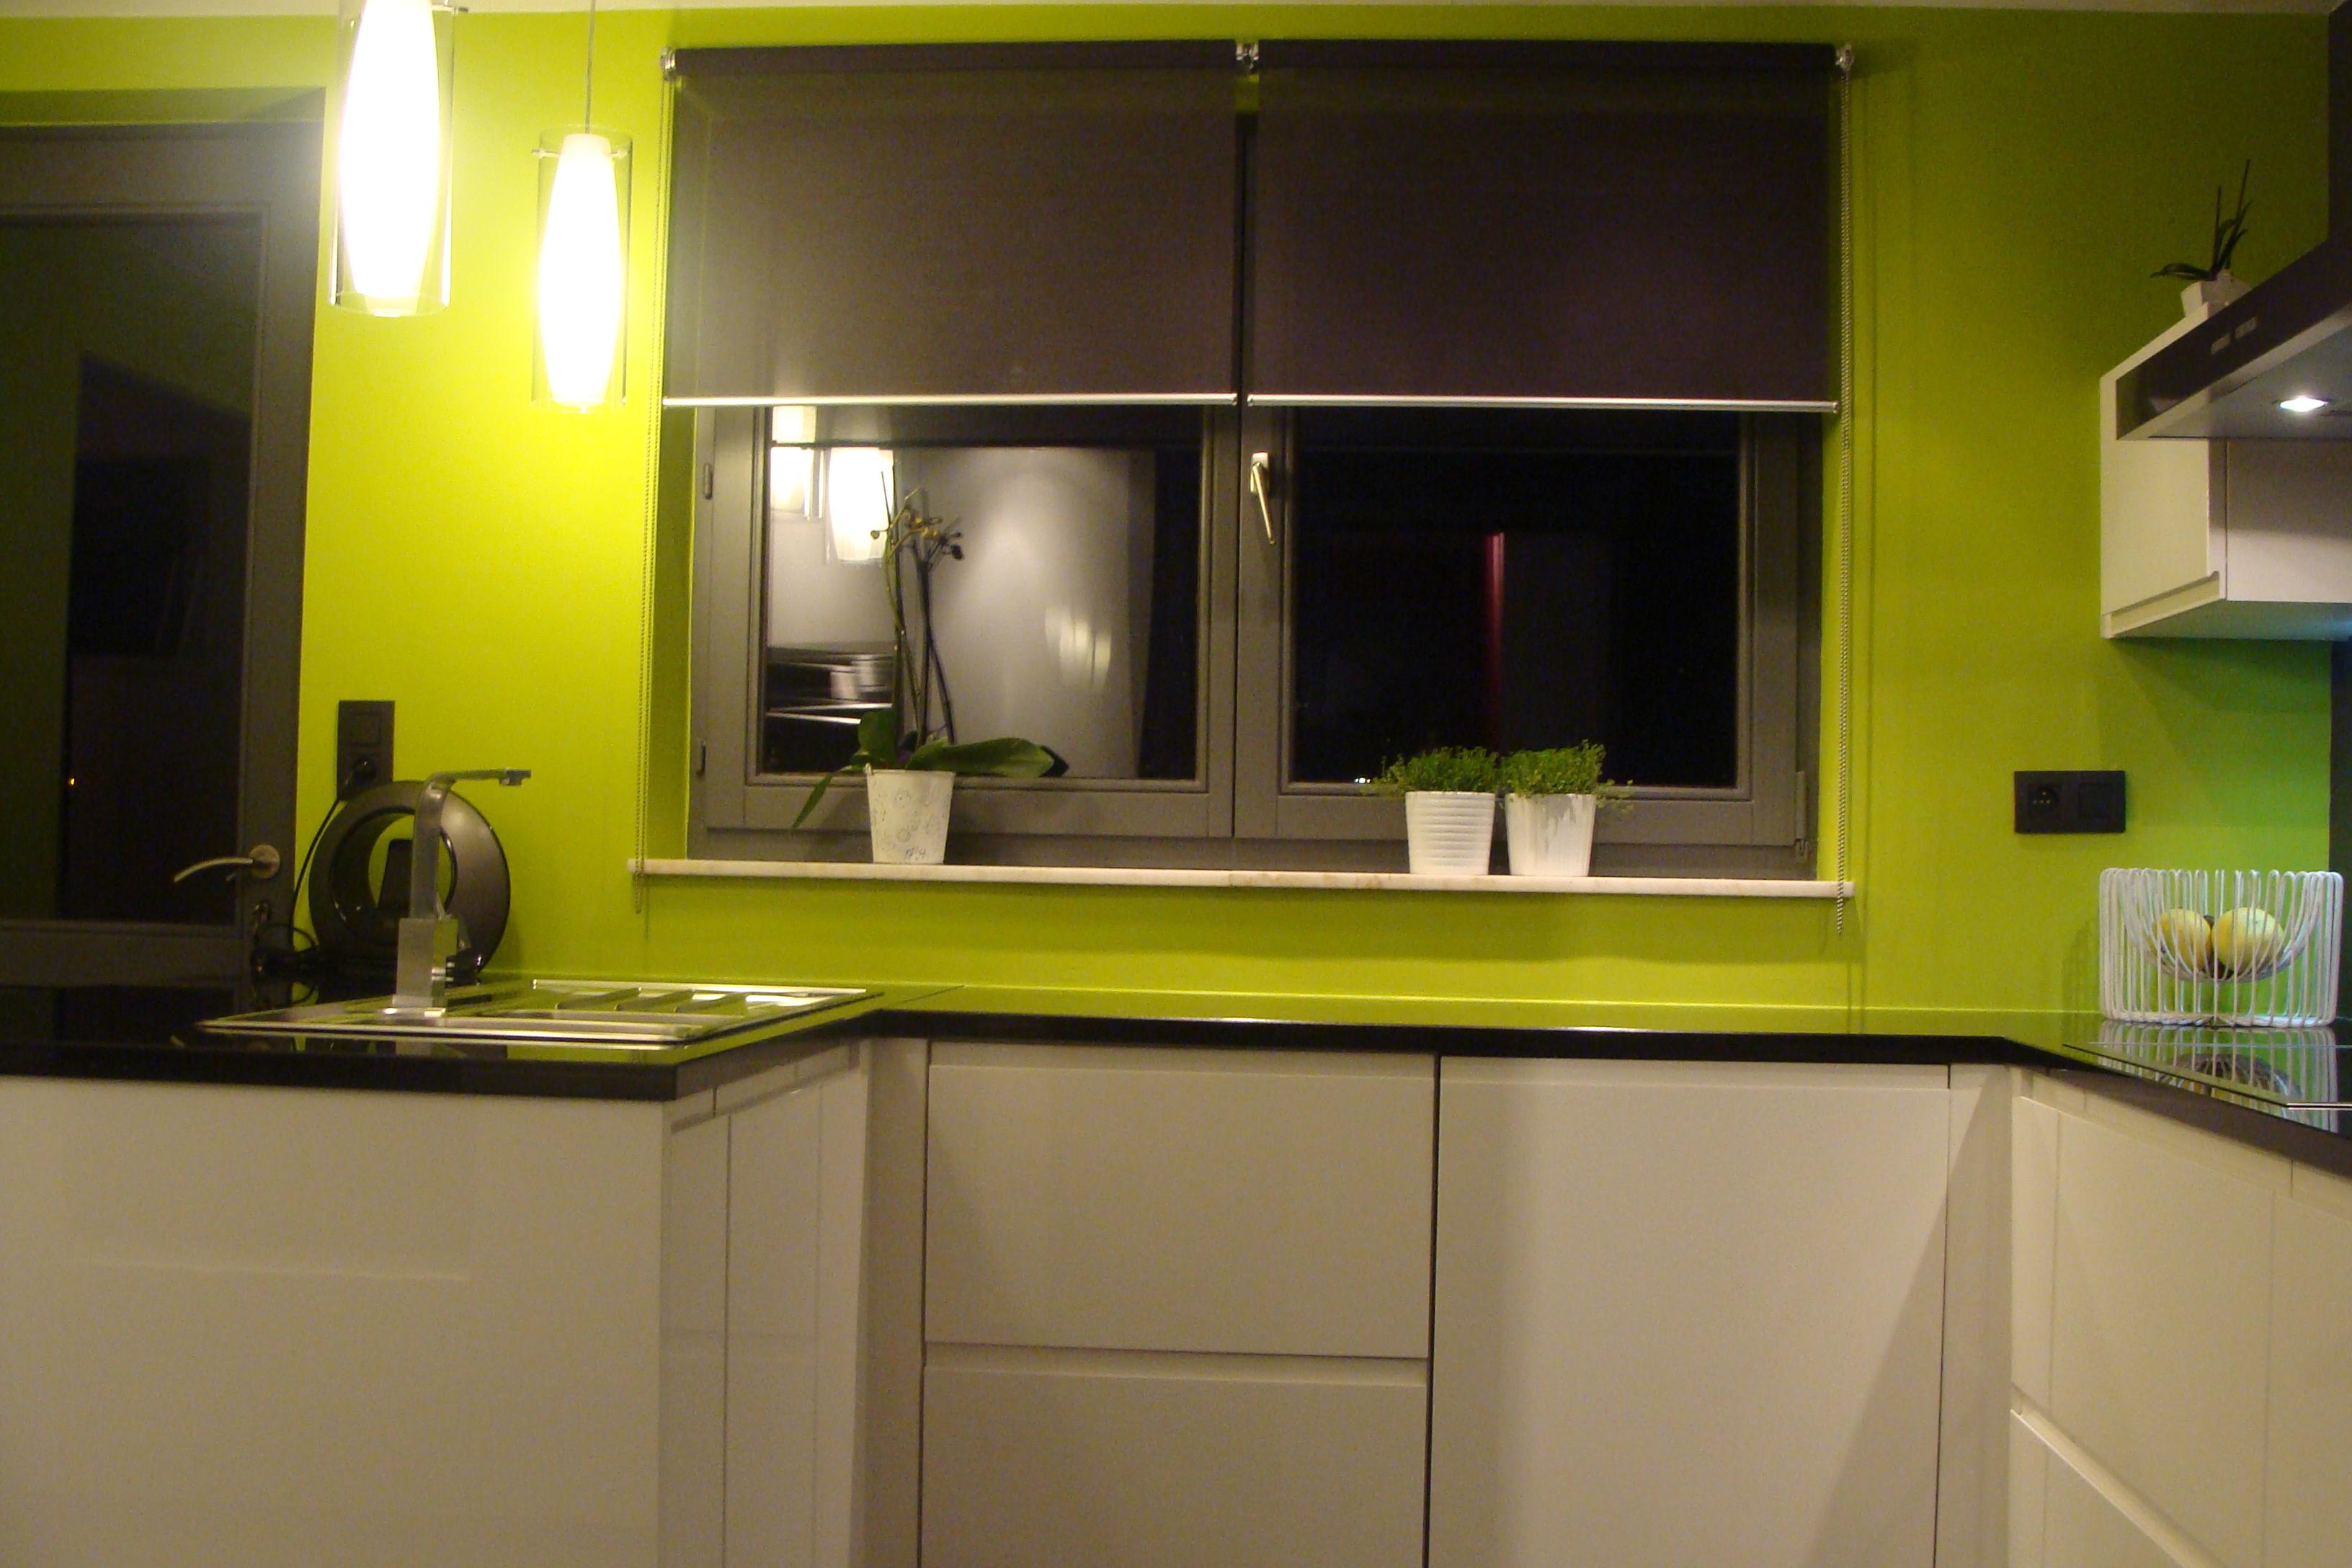 plan travail cuisine vert - atwebster.fr - maison et mobilier